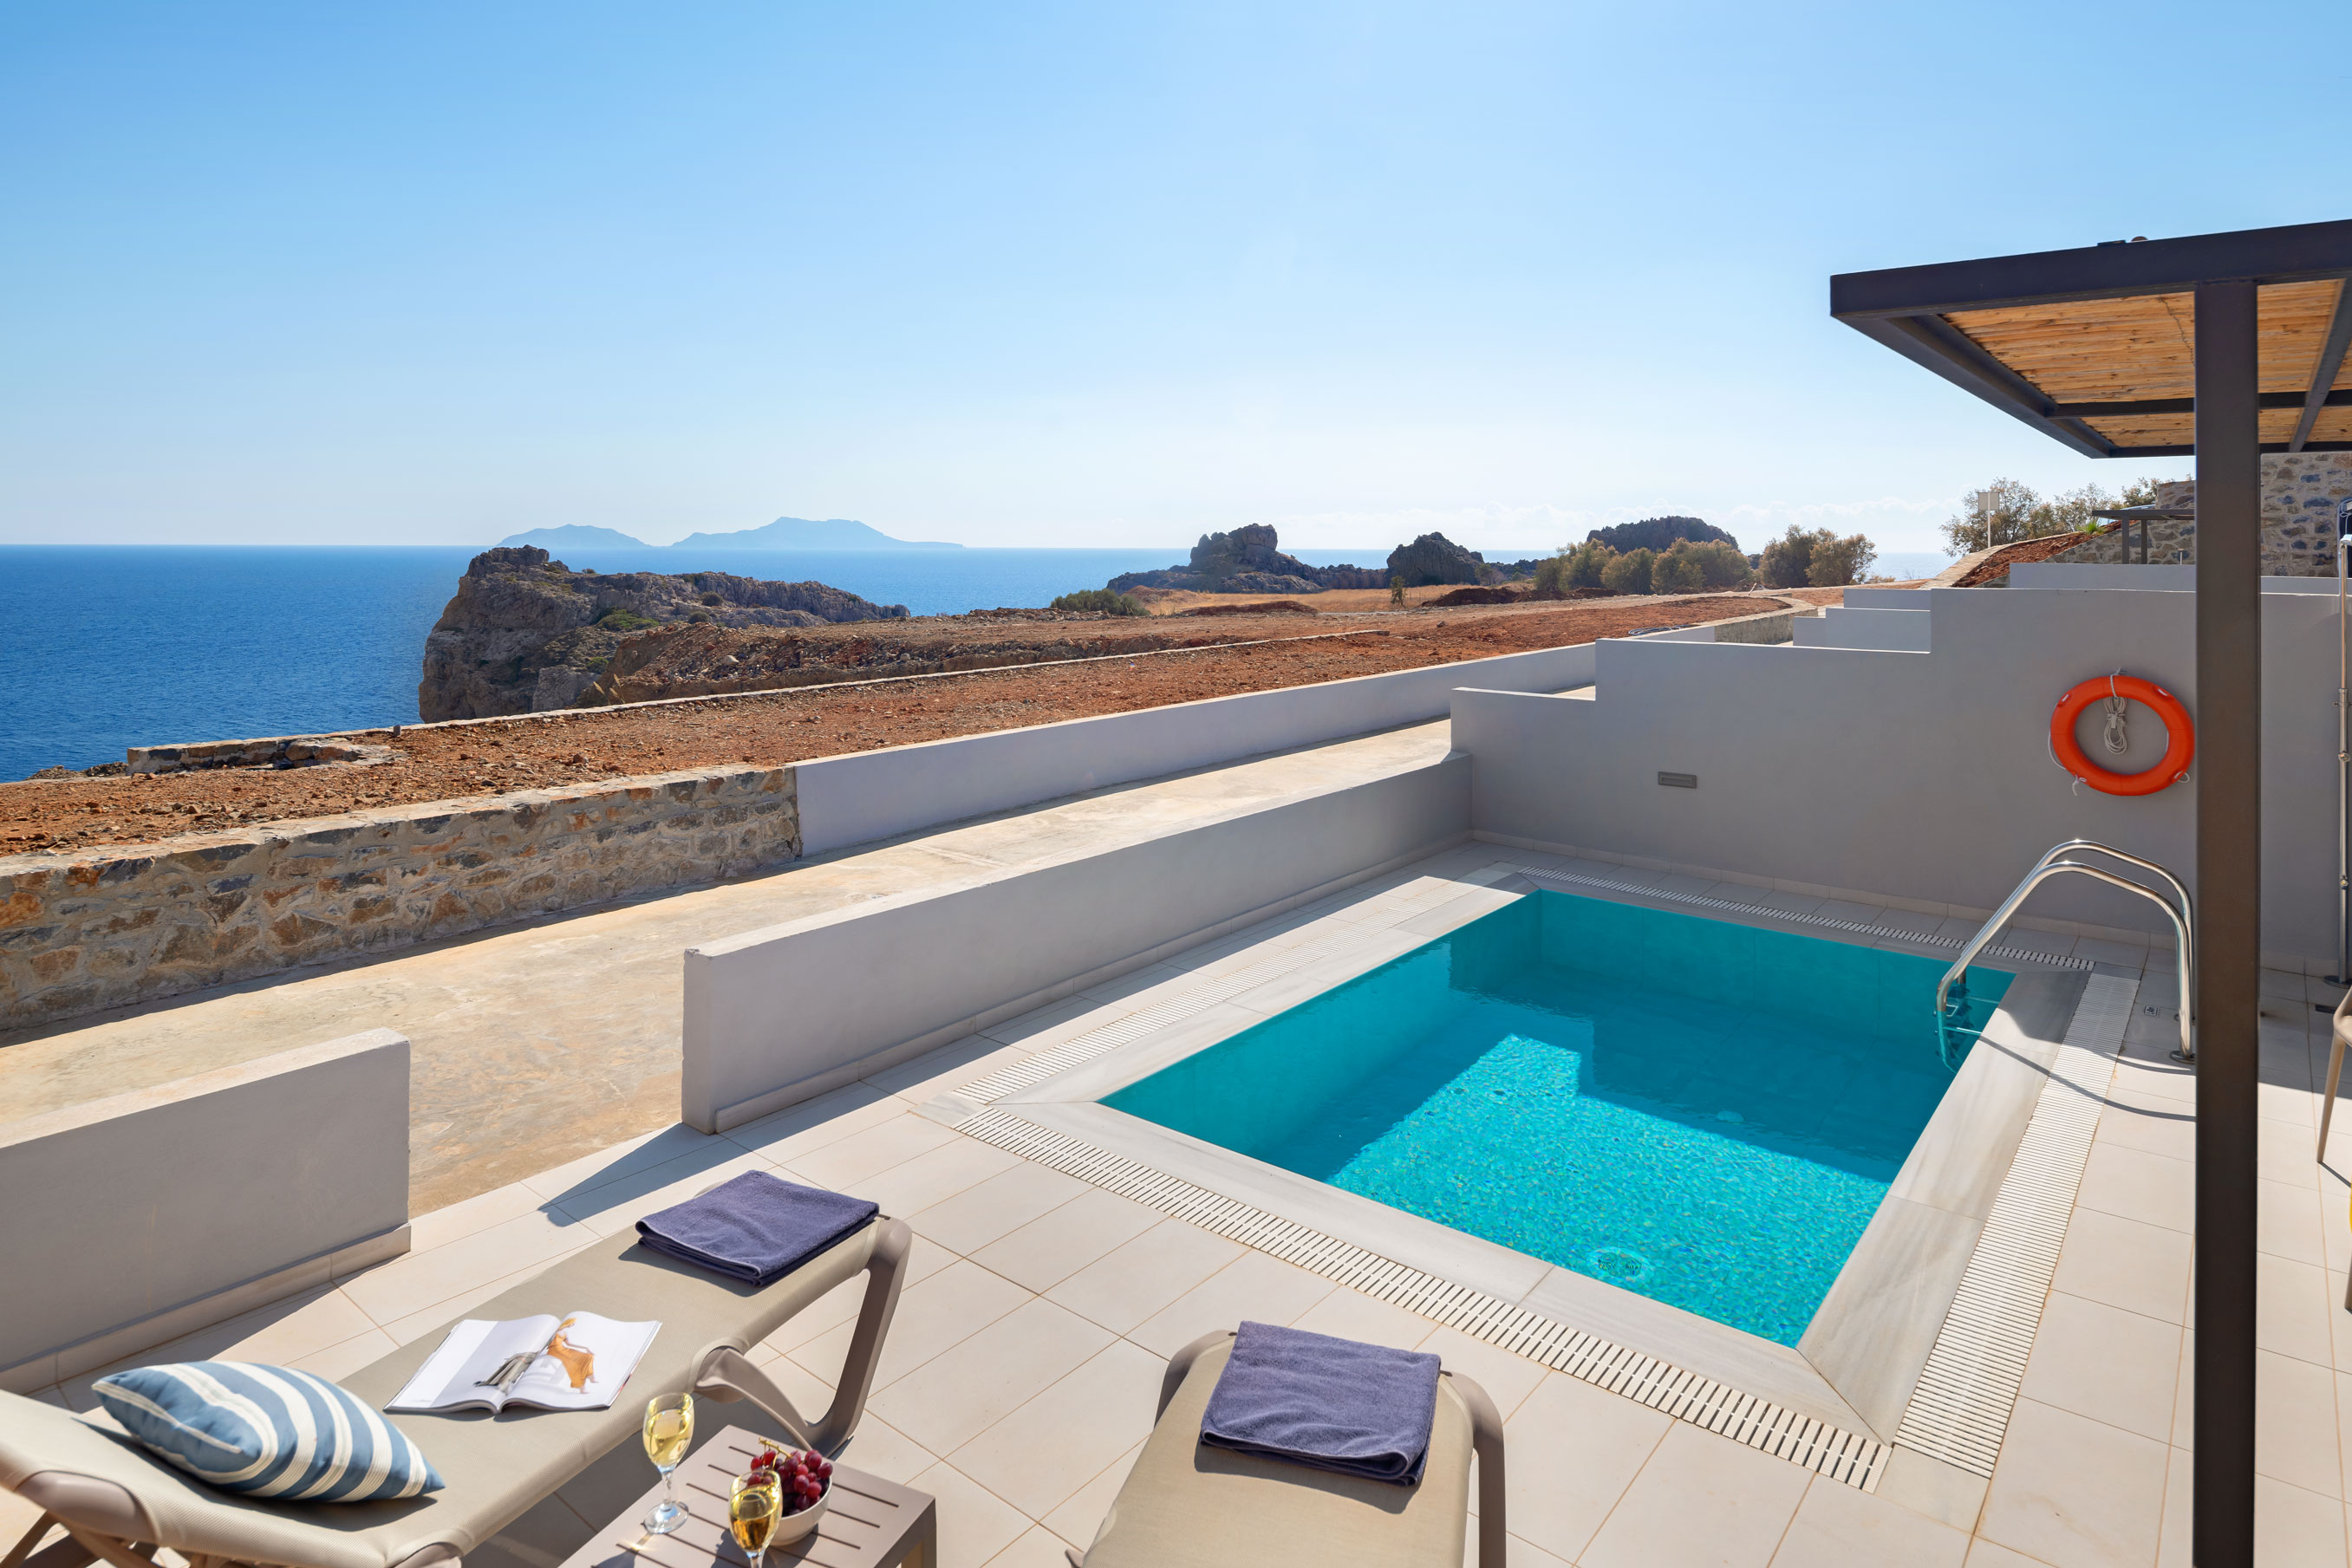 pool-of-1-bedroom-villa1